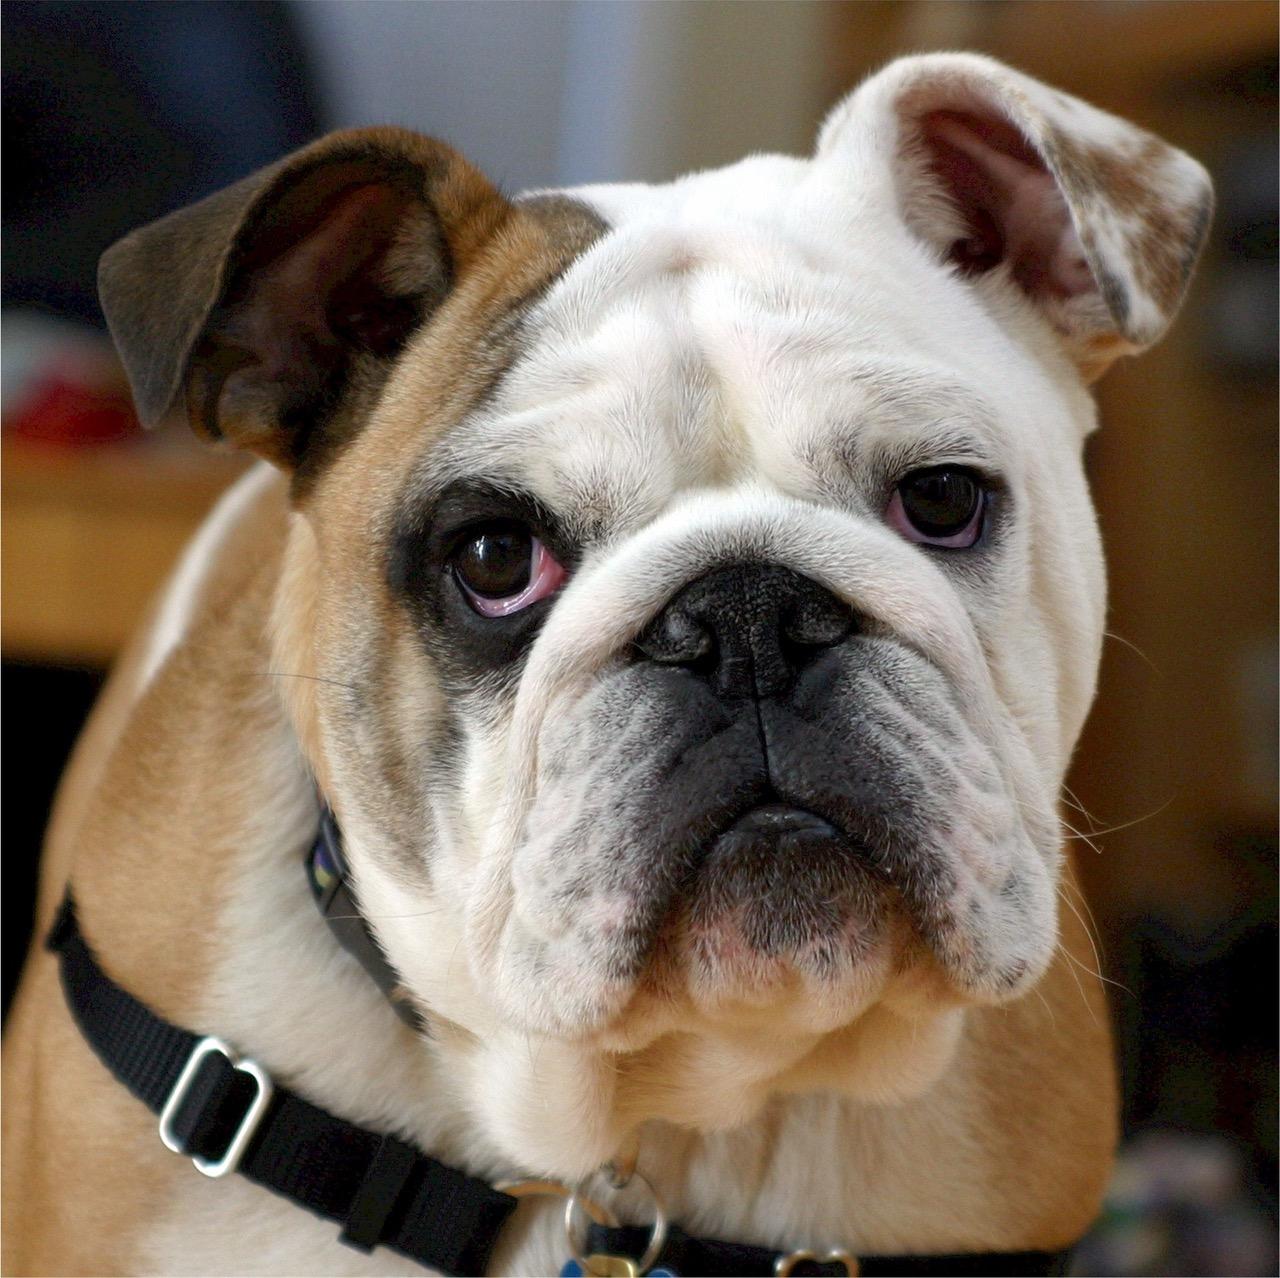 english-bulldog-bulldog-canine-dog-40544